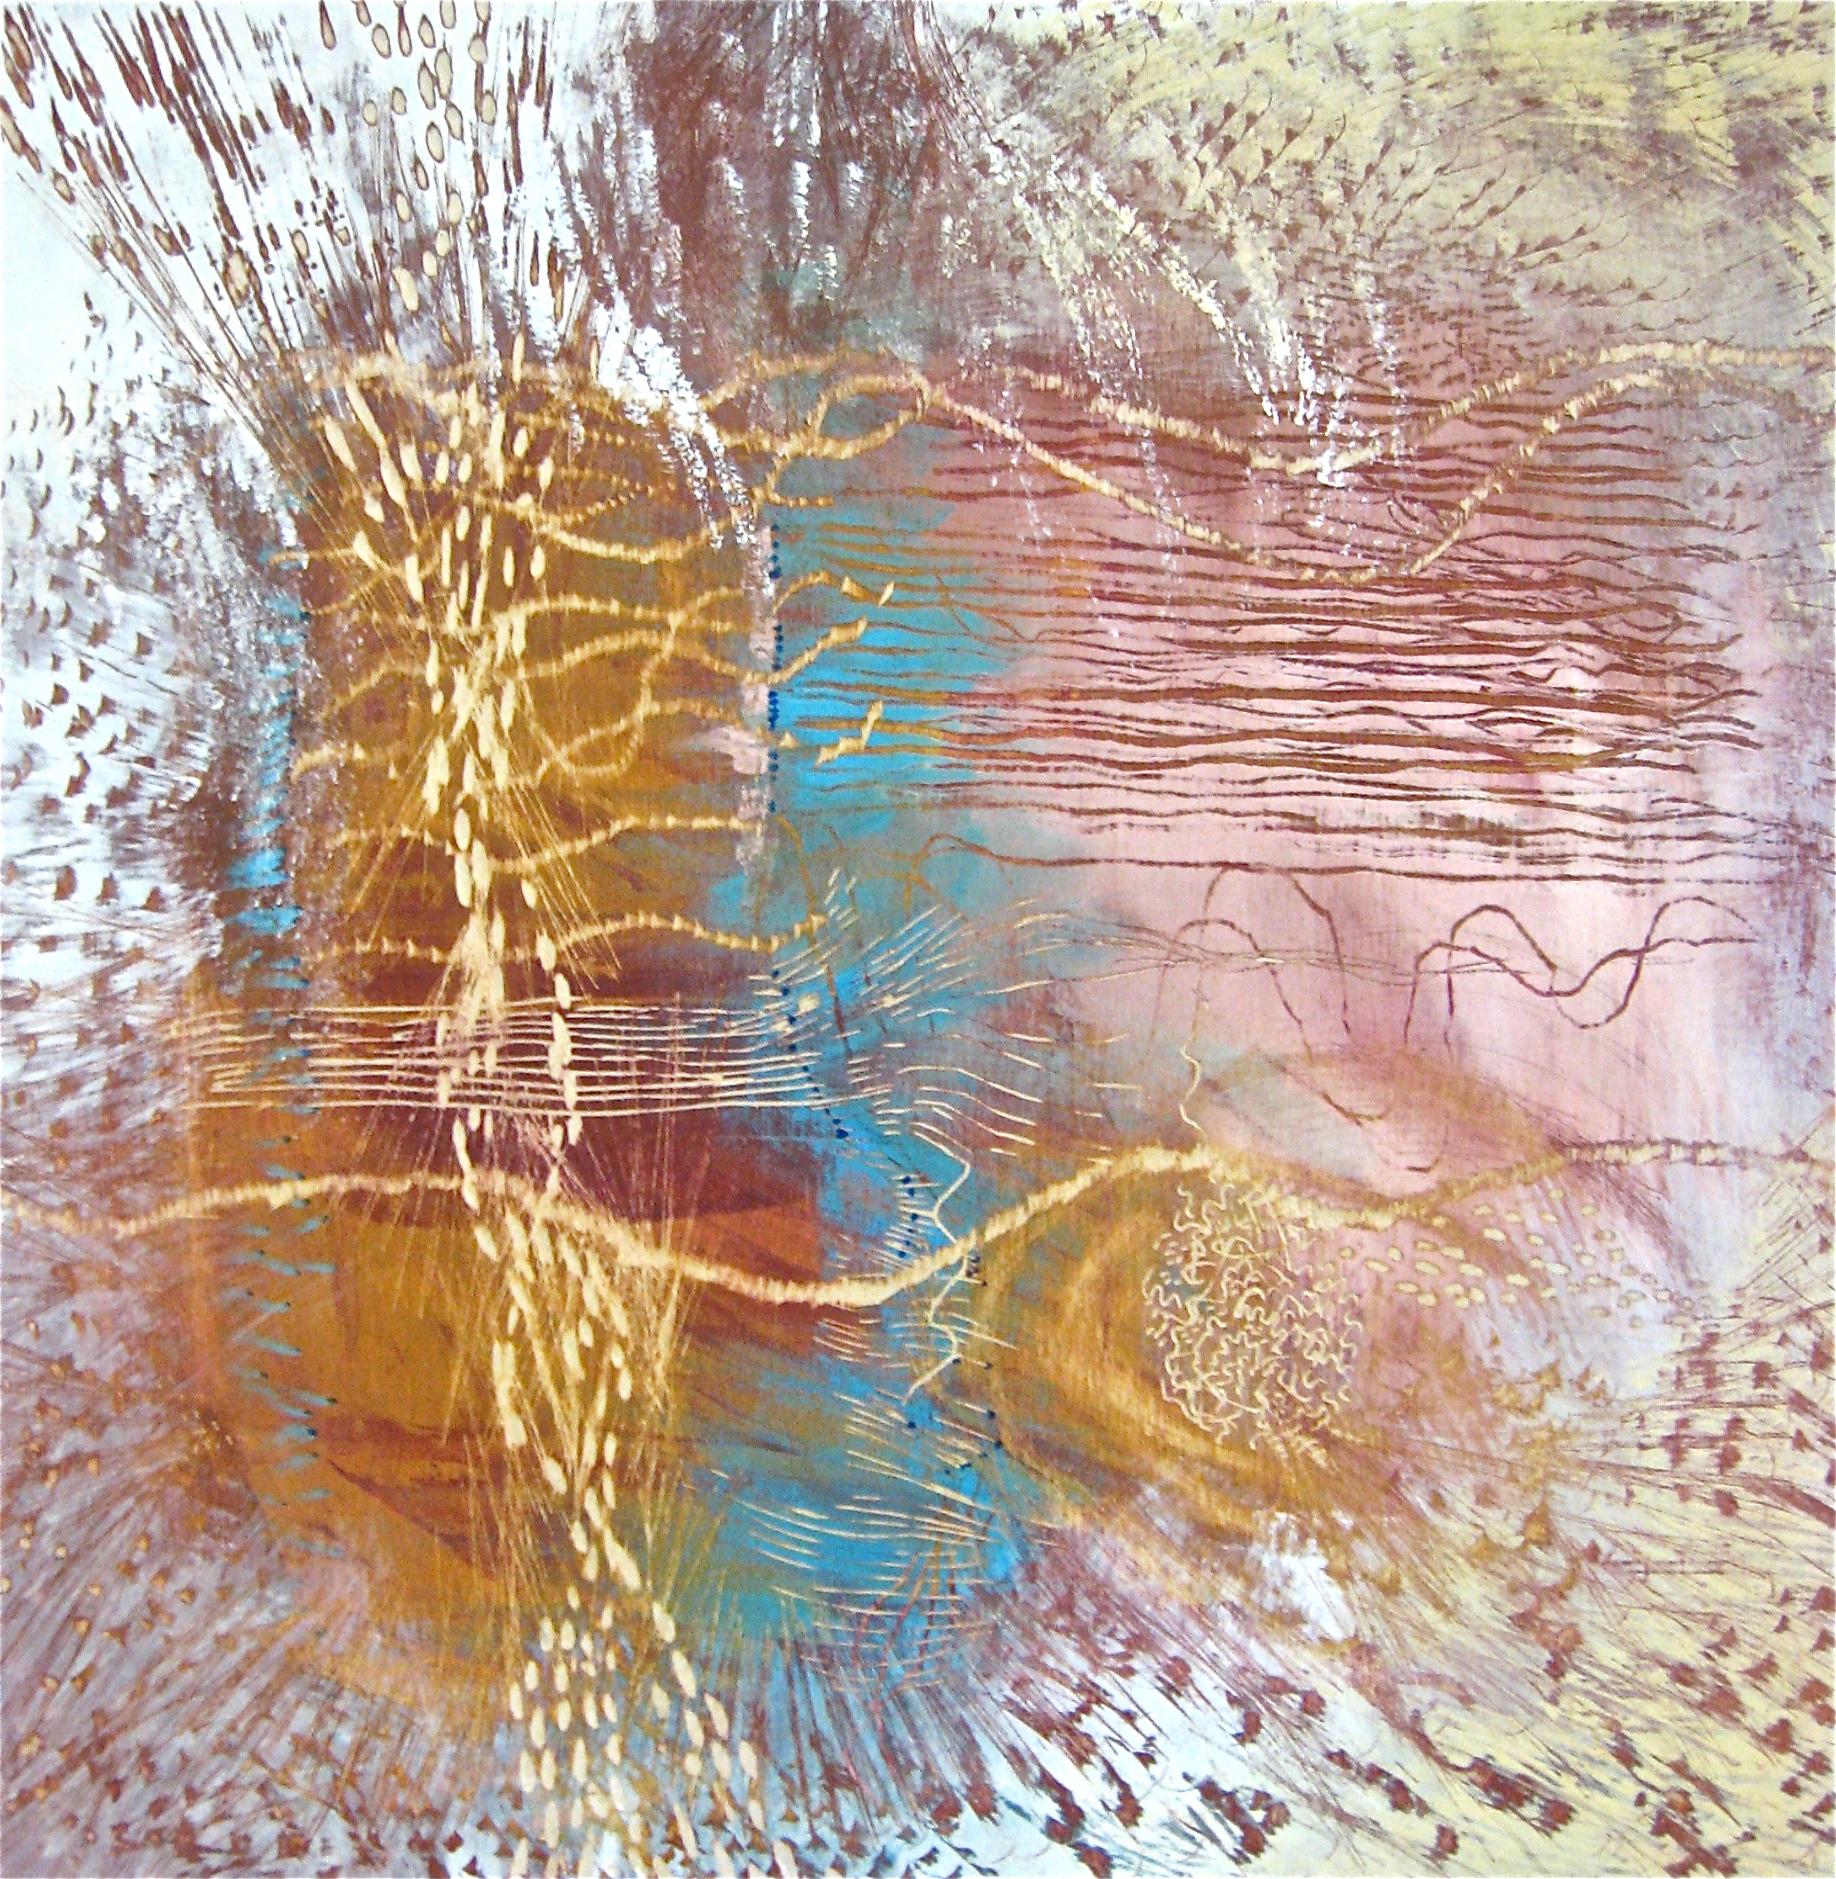 "MARALYNN CHERRY  River Soundings , 2013 Acrylic paint, carving, rasping and sanding on birch ply 24"" x 24"""